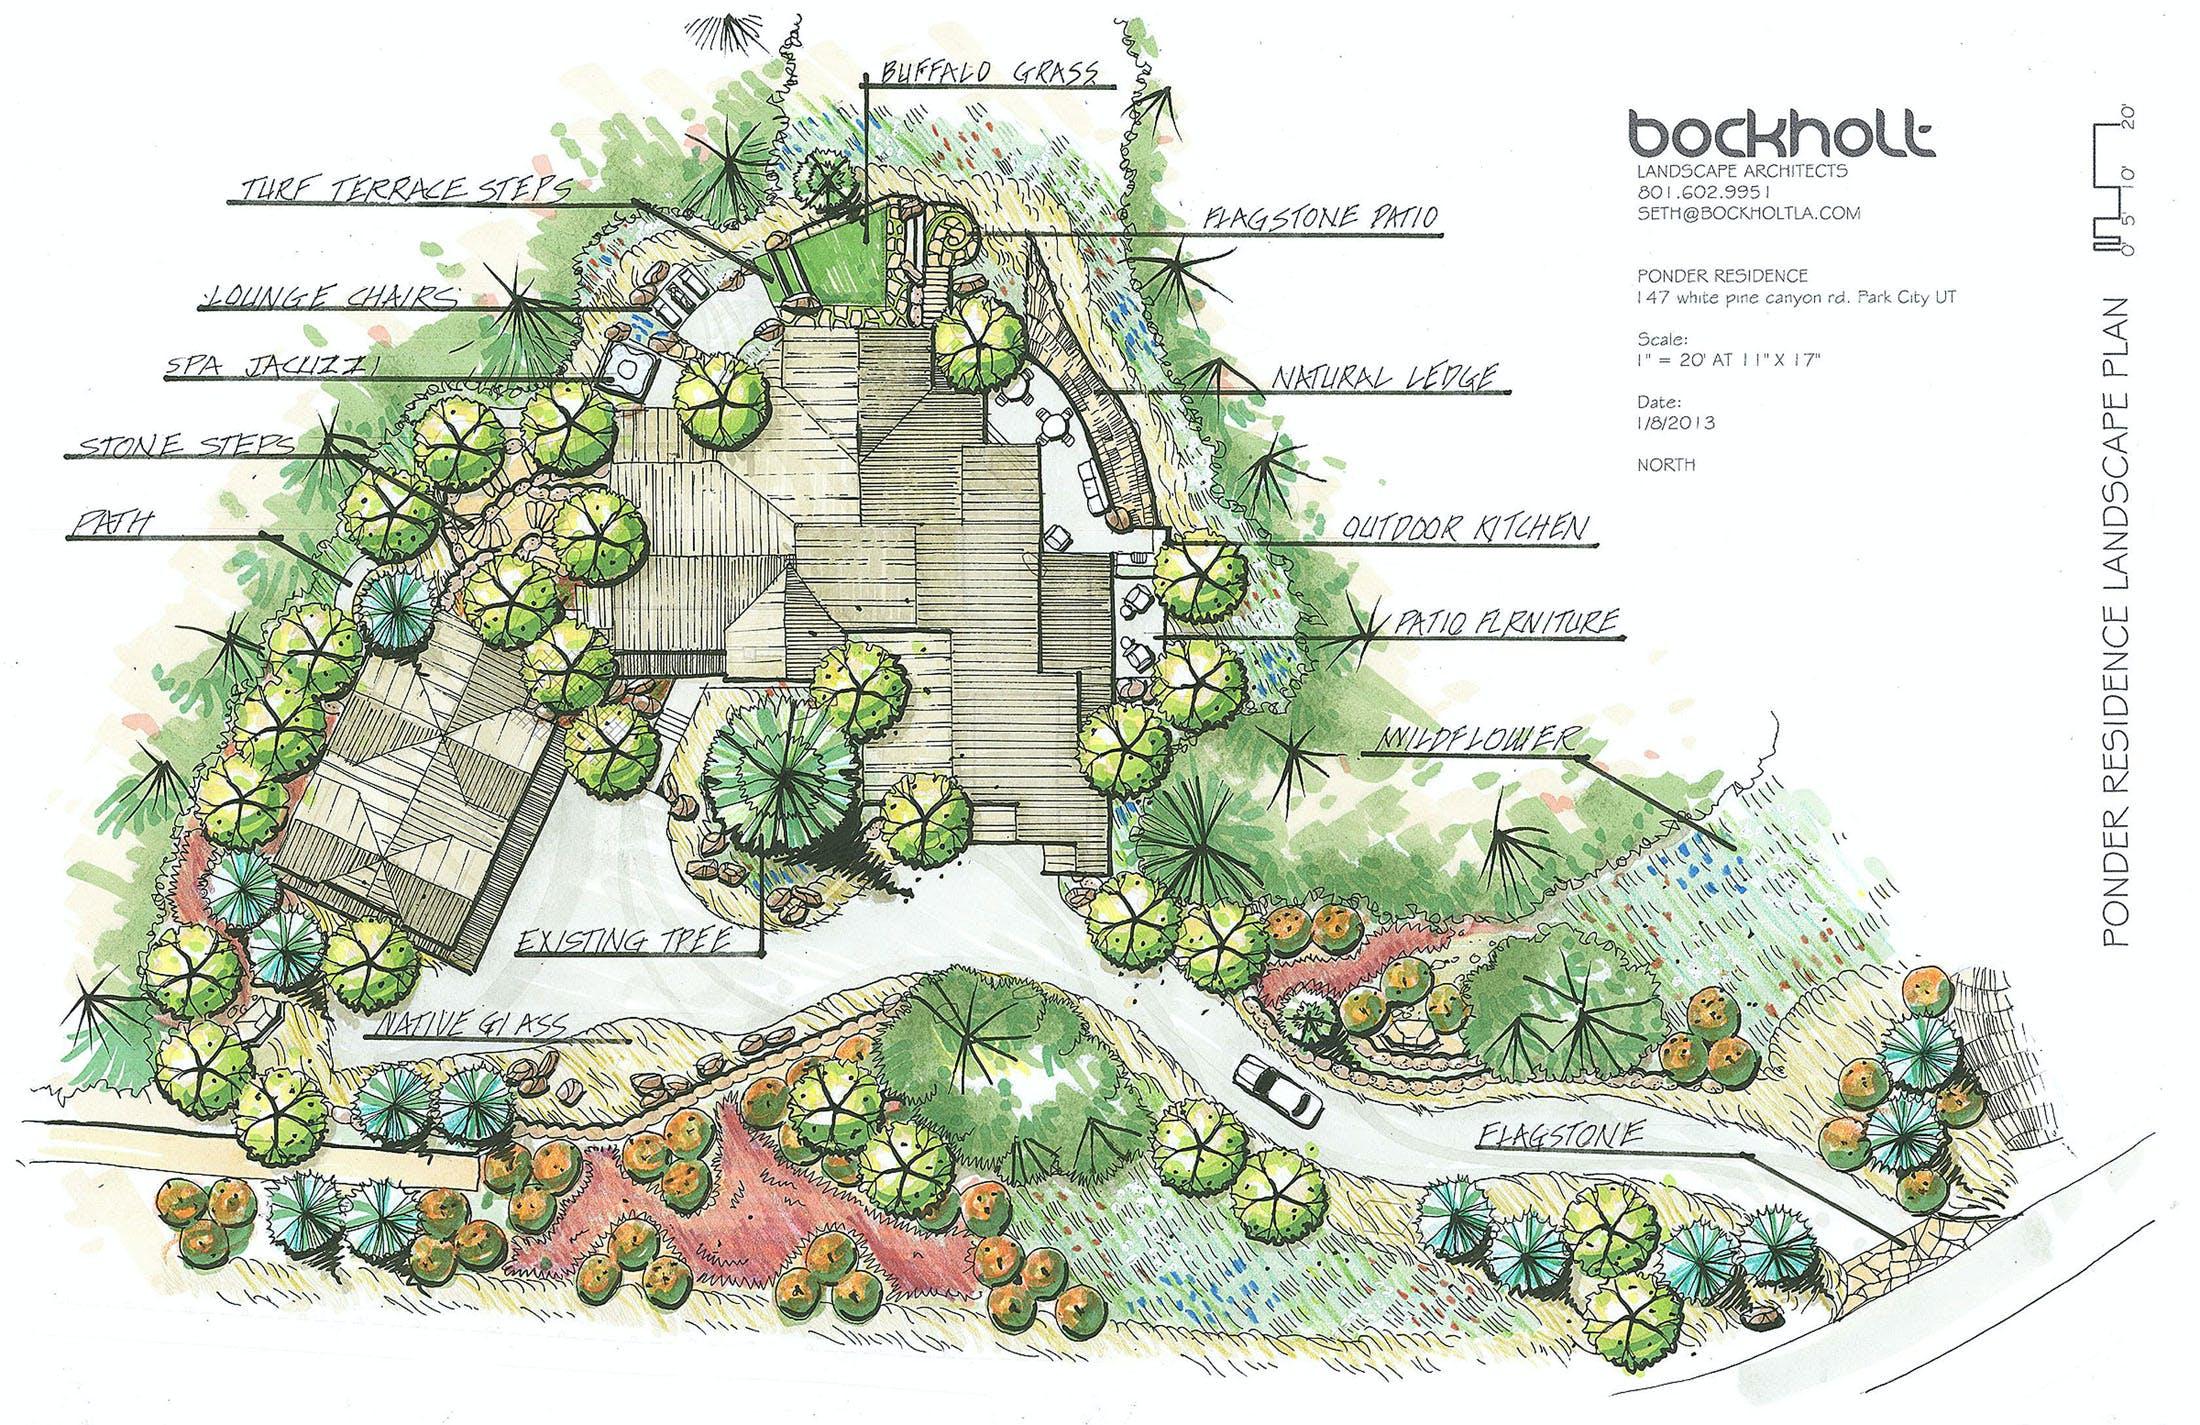 Ponder residence bockholt landscape architecture archinect for Mountain designs garden city